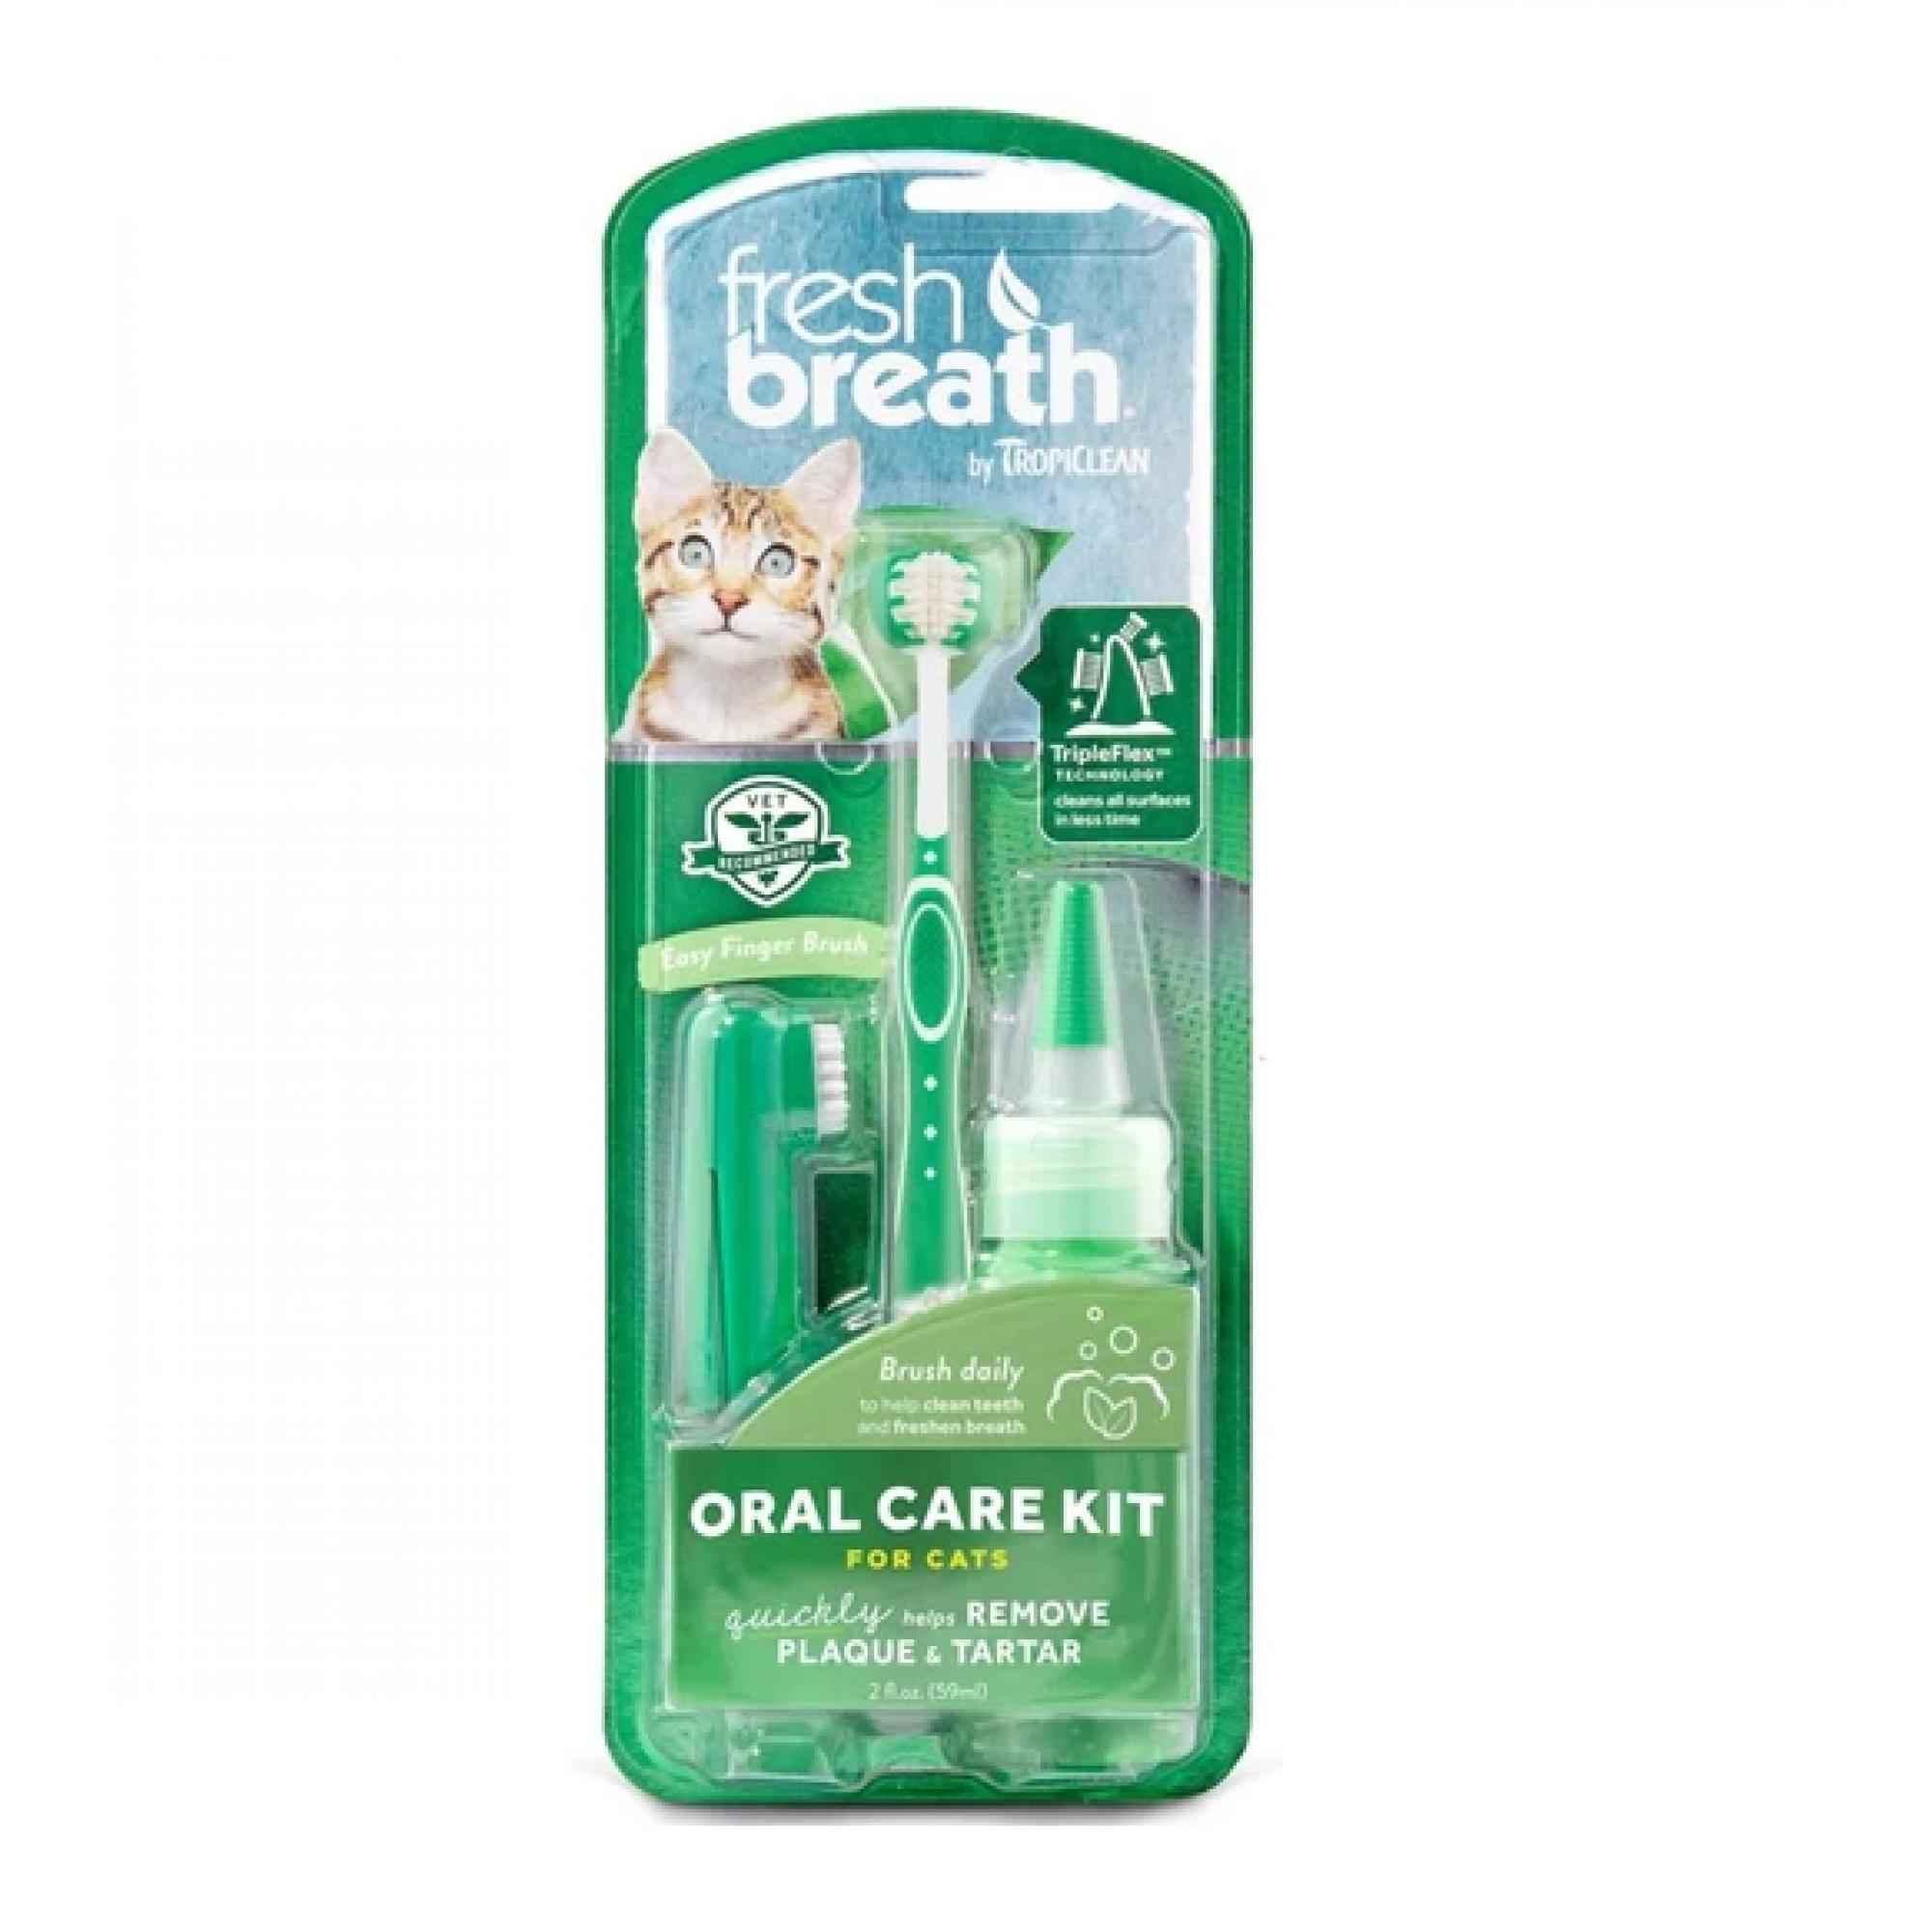 Tropiclean FRESH BREATH Oral Care Kit for Cat 2oz (59ml)